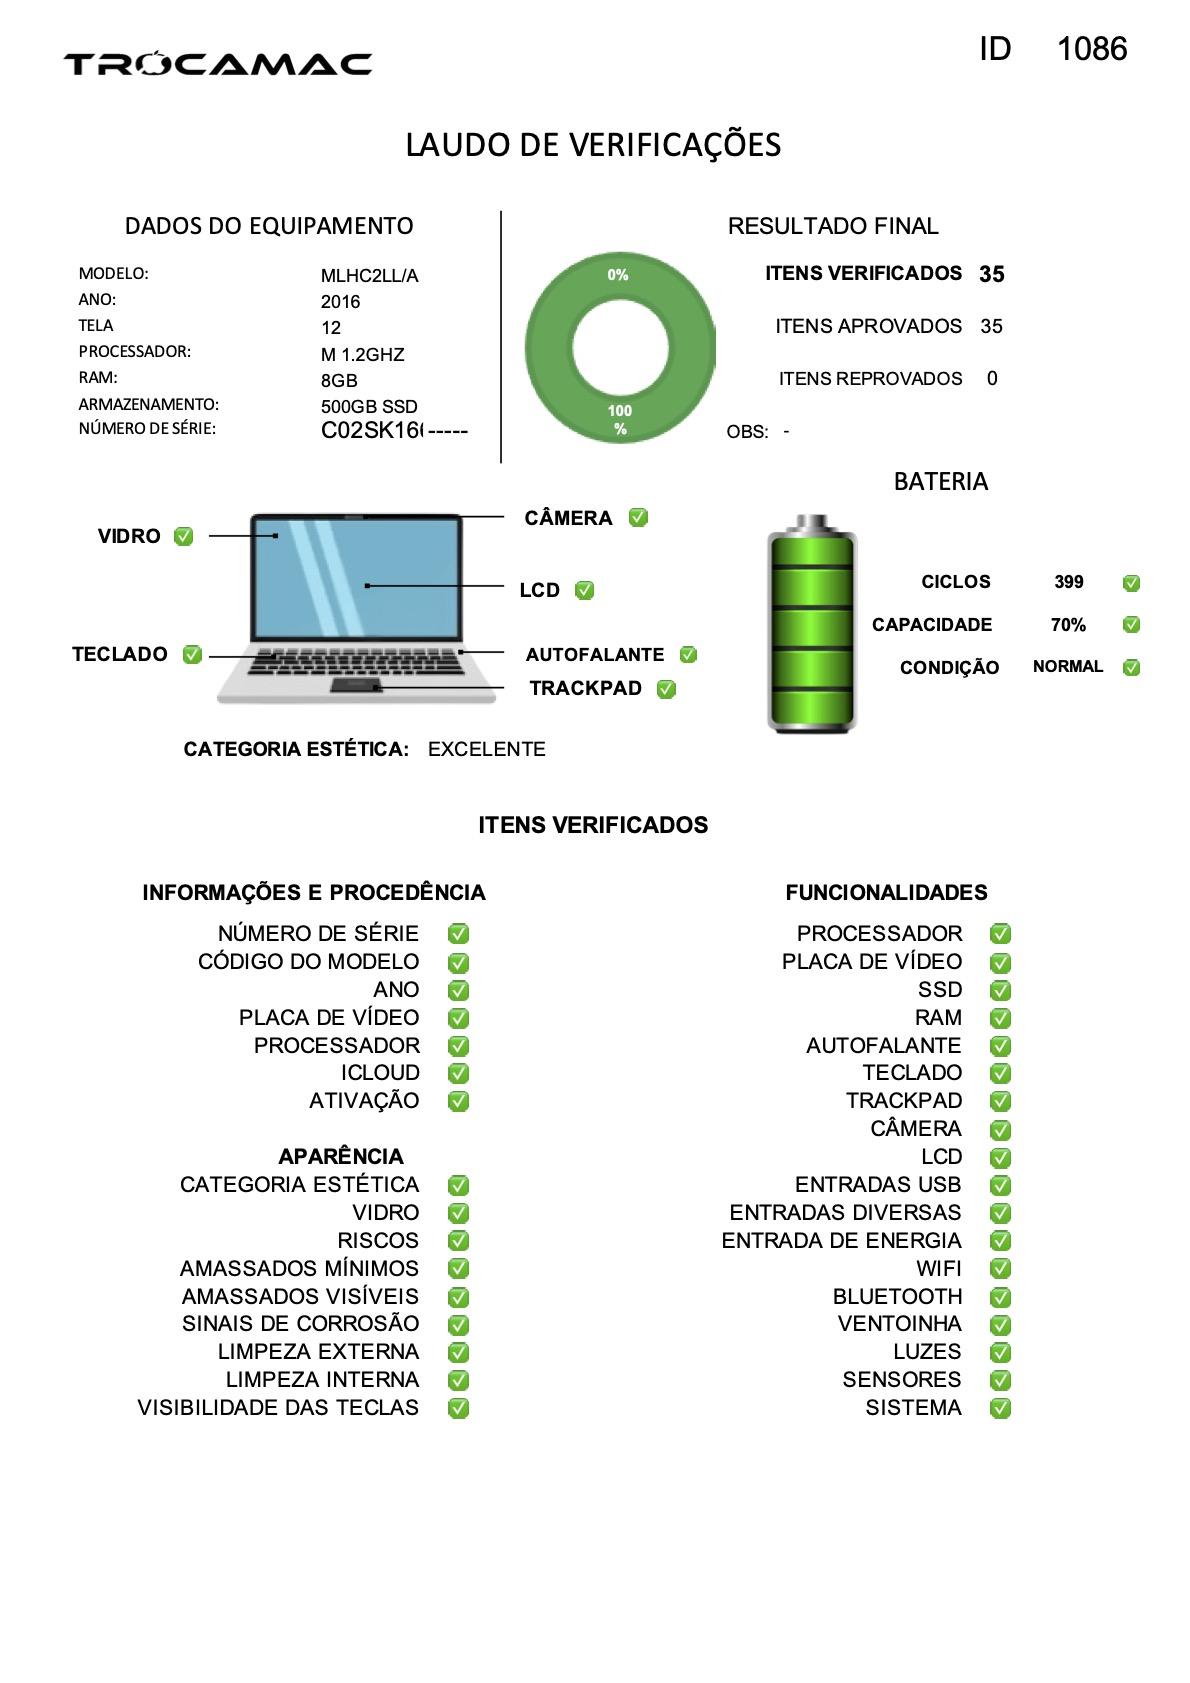 Macbook 12 M Space Gray 1.2Ghz 8GB 512GB SSD MLHC2LL/A Seminovo